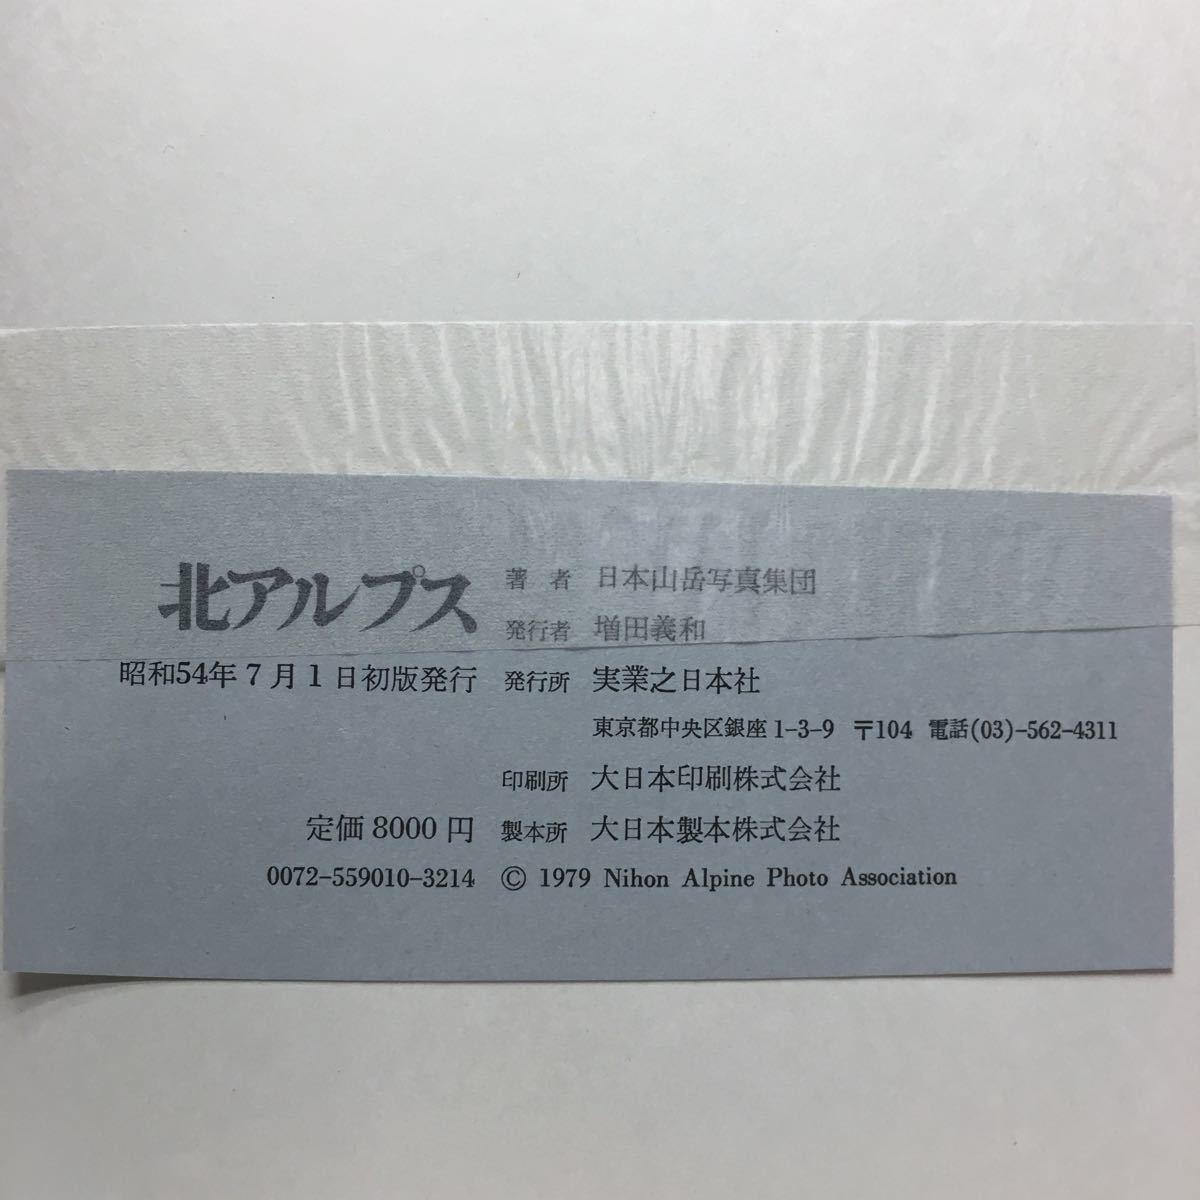 x2/北アルプス 日本山岳写真集団 昭和54年初版 定価8000円_画像10